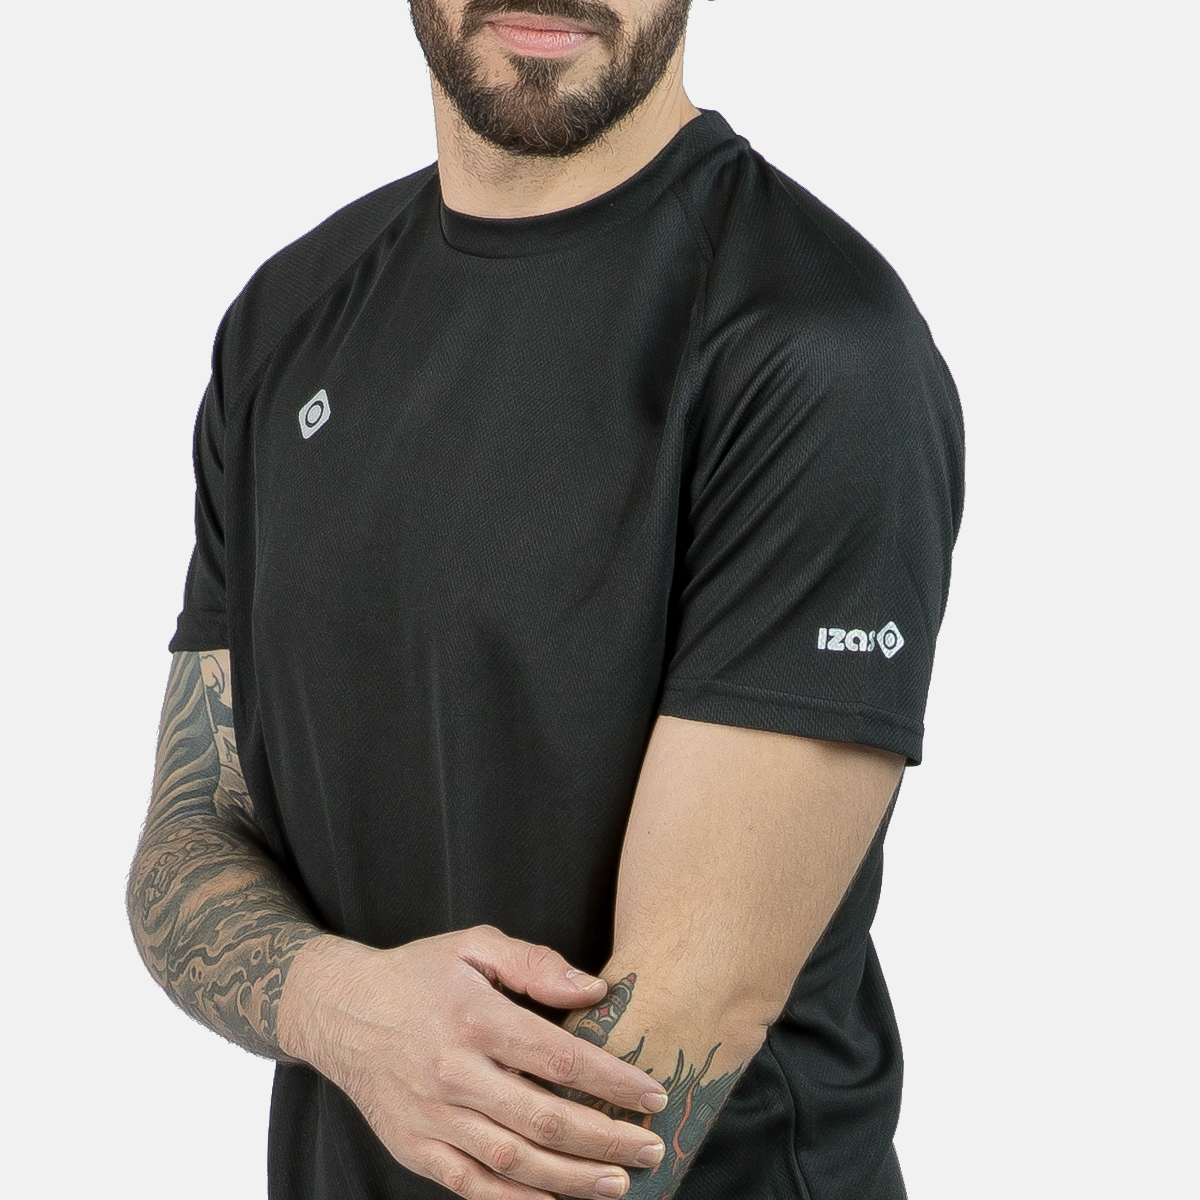 MAN'S CREUS II T-SHIRT BLACK